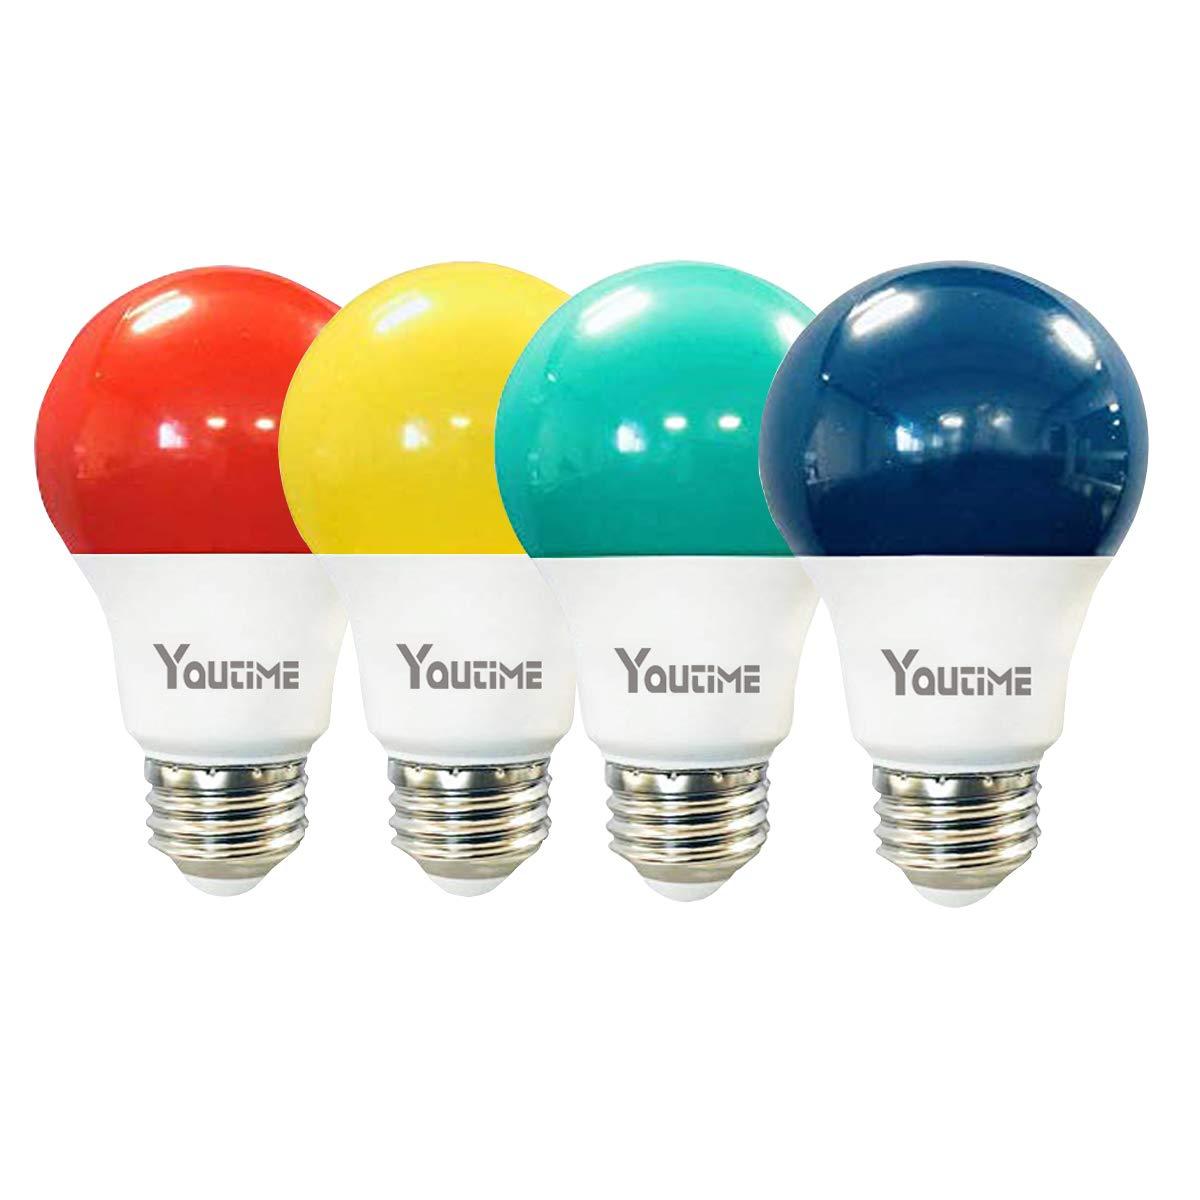 Youtime A19 LED Yellow Bug Light Bulb 7W Daylight White 5000K with E26 Medium Base, 4 Packs